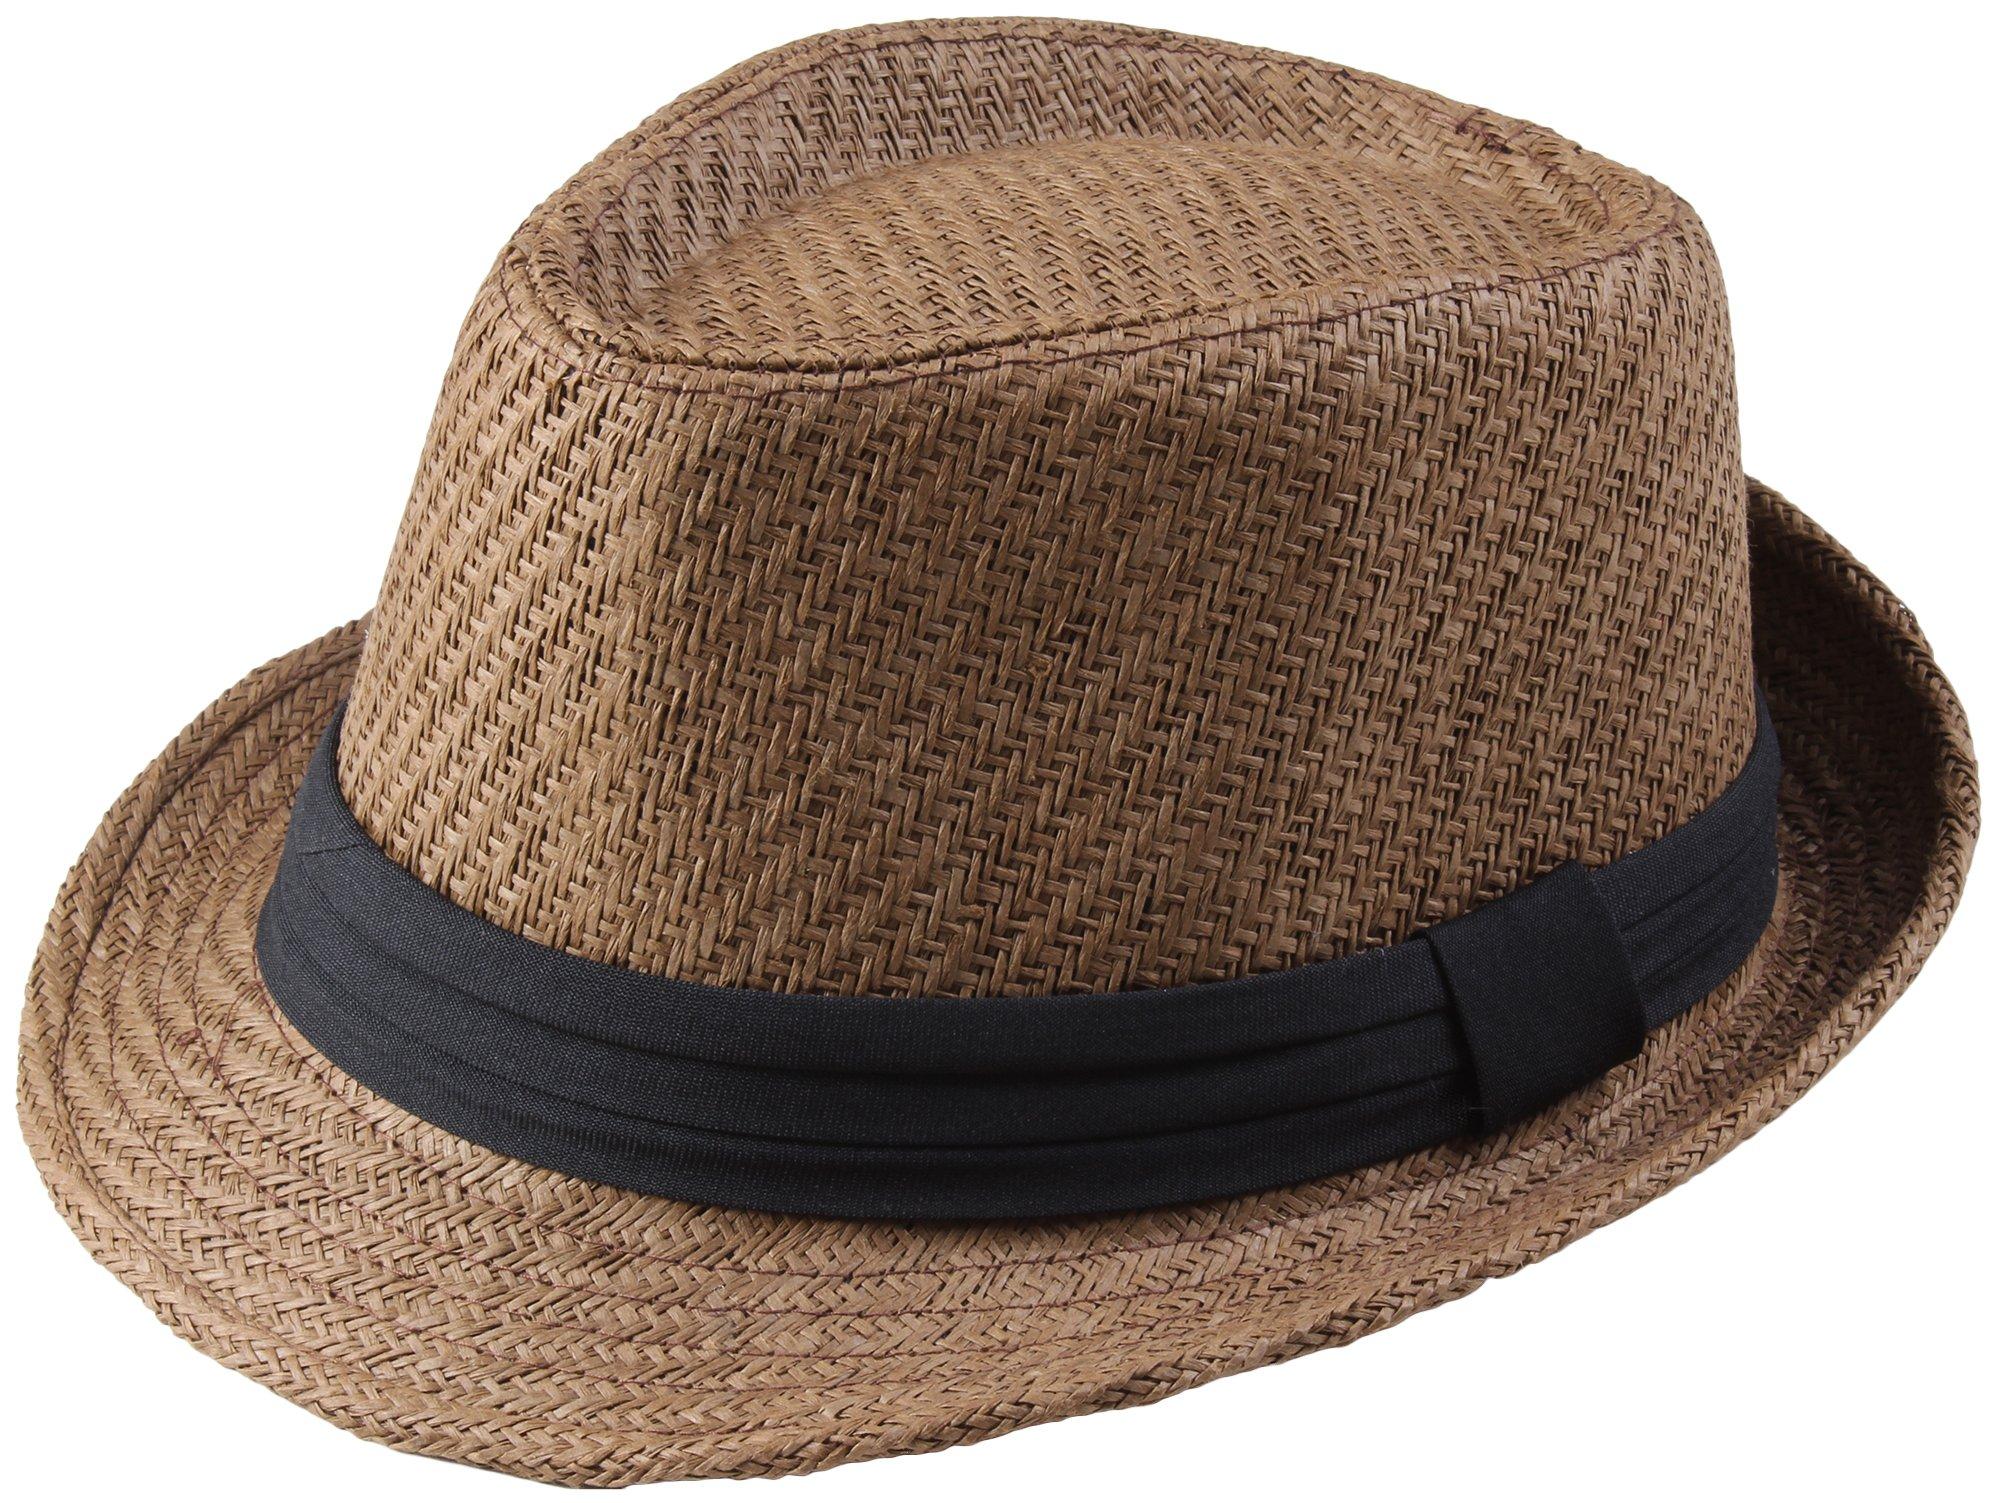 Classic Fedra Unisex Woven Hat Summer w/Stylish Band - B